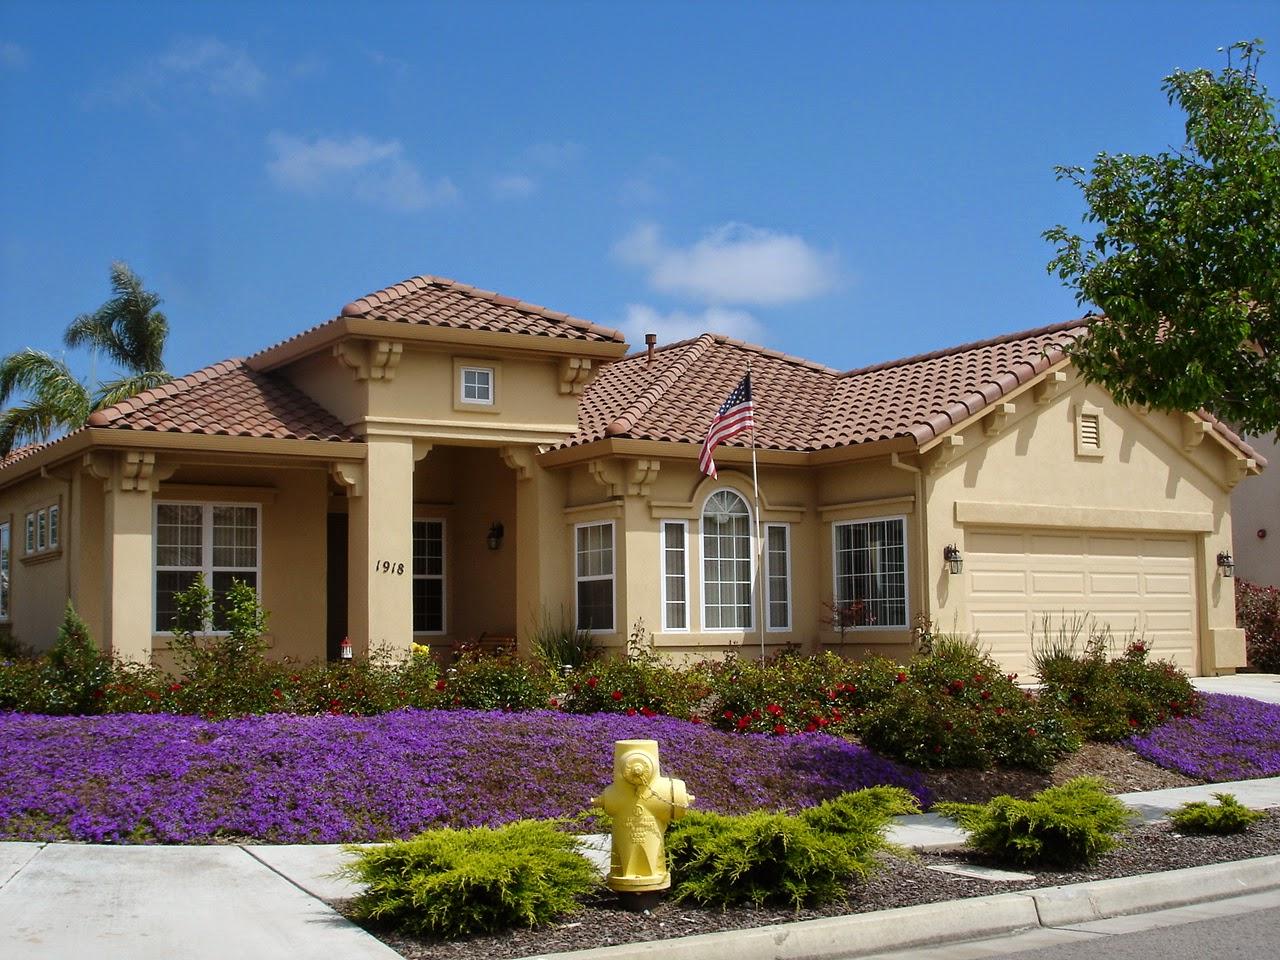 Modern Exterior Home Design Idea